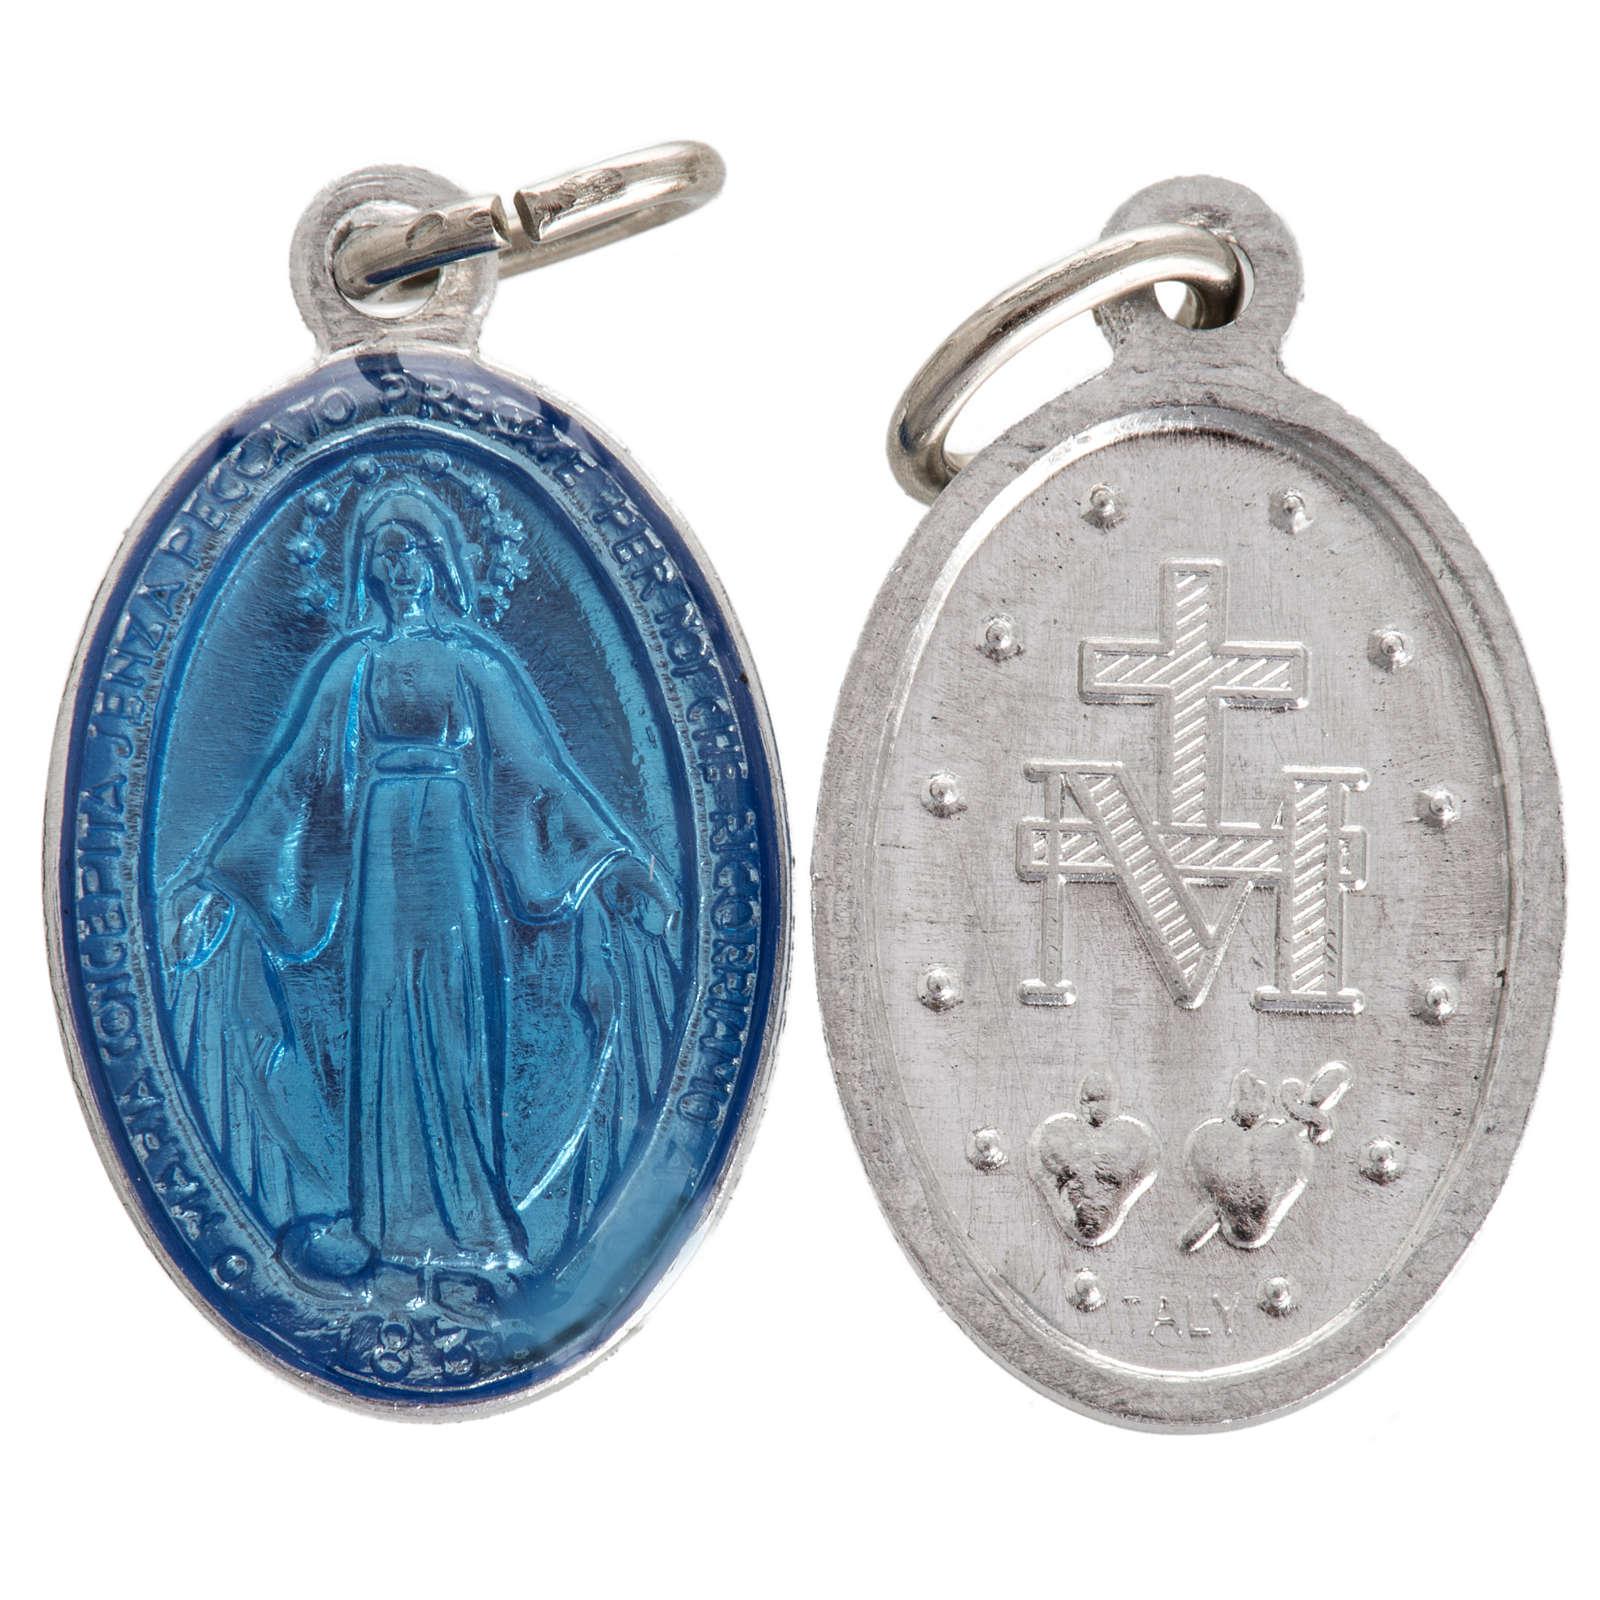 Médaille Miraculeuse émail bleu 18mm 4